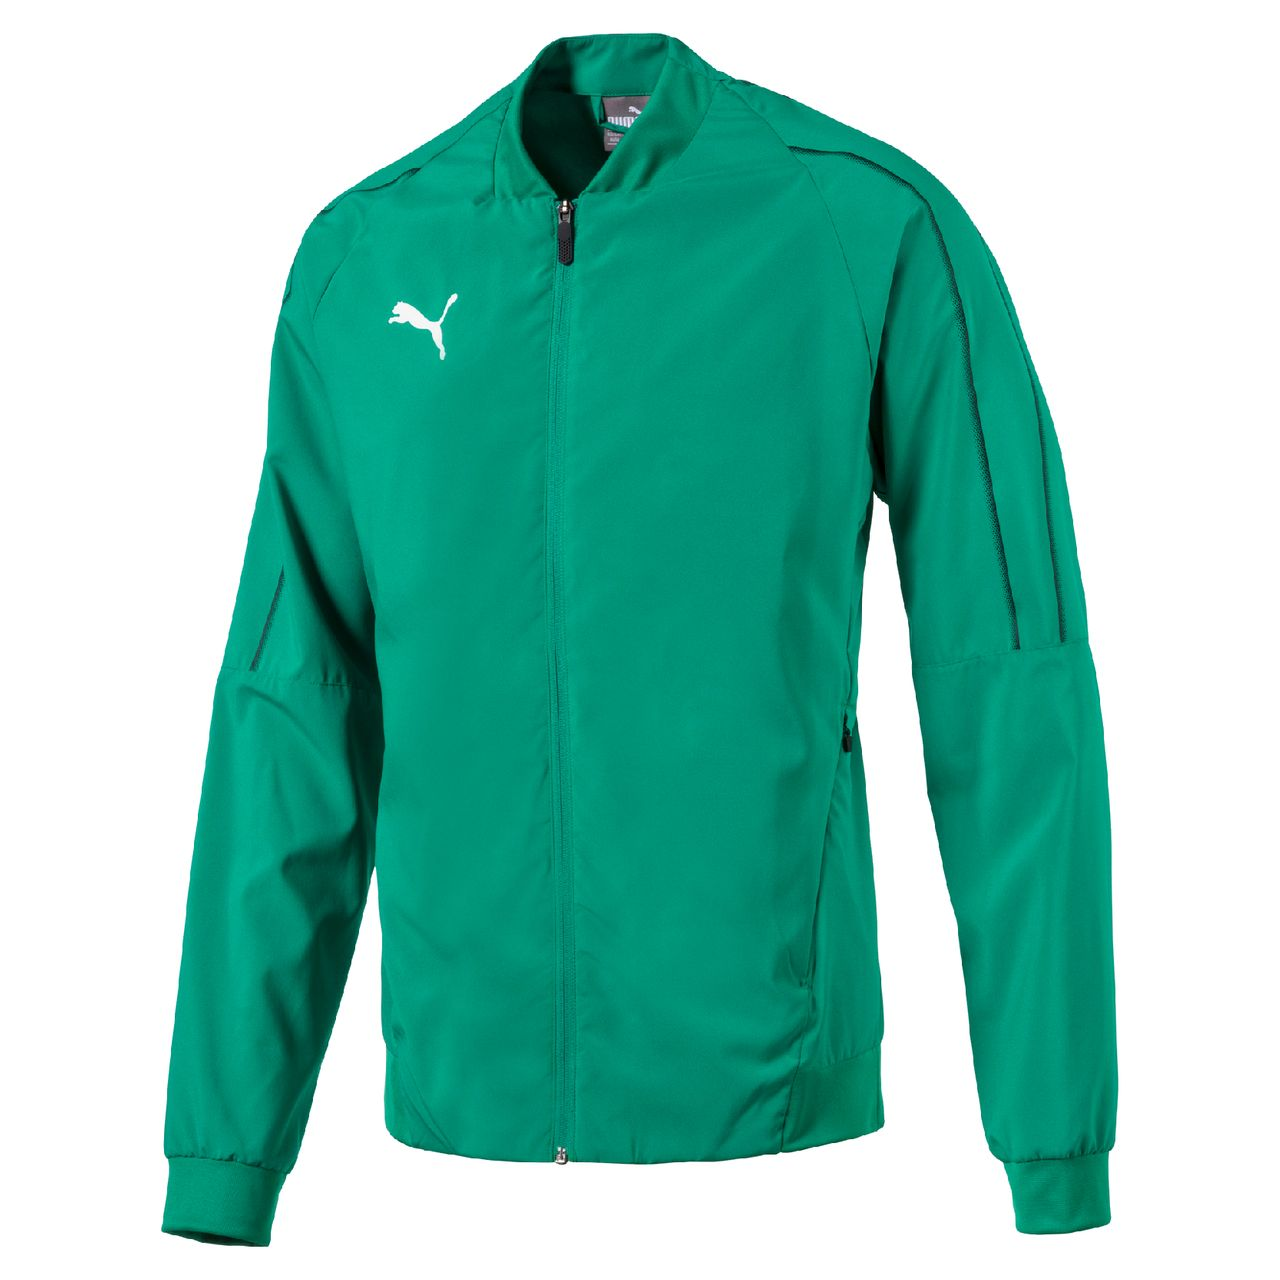 PUMA FINAL Sideline Jacket